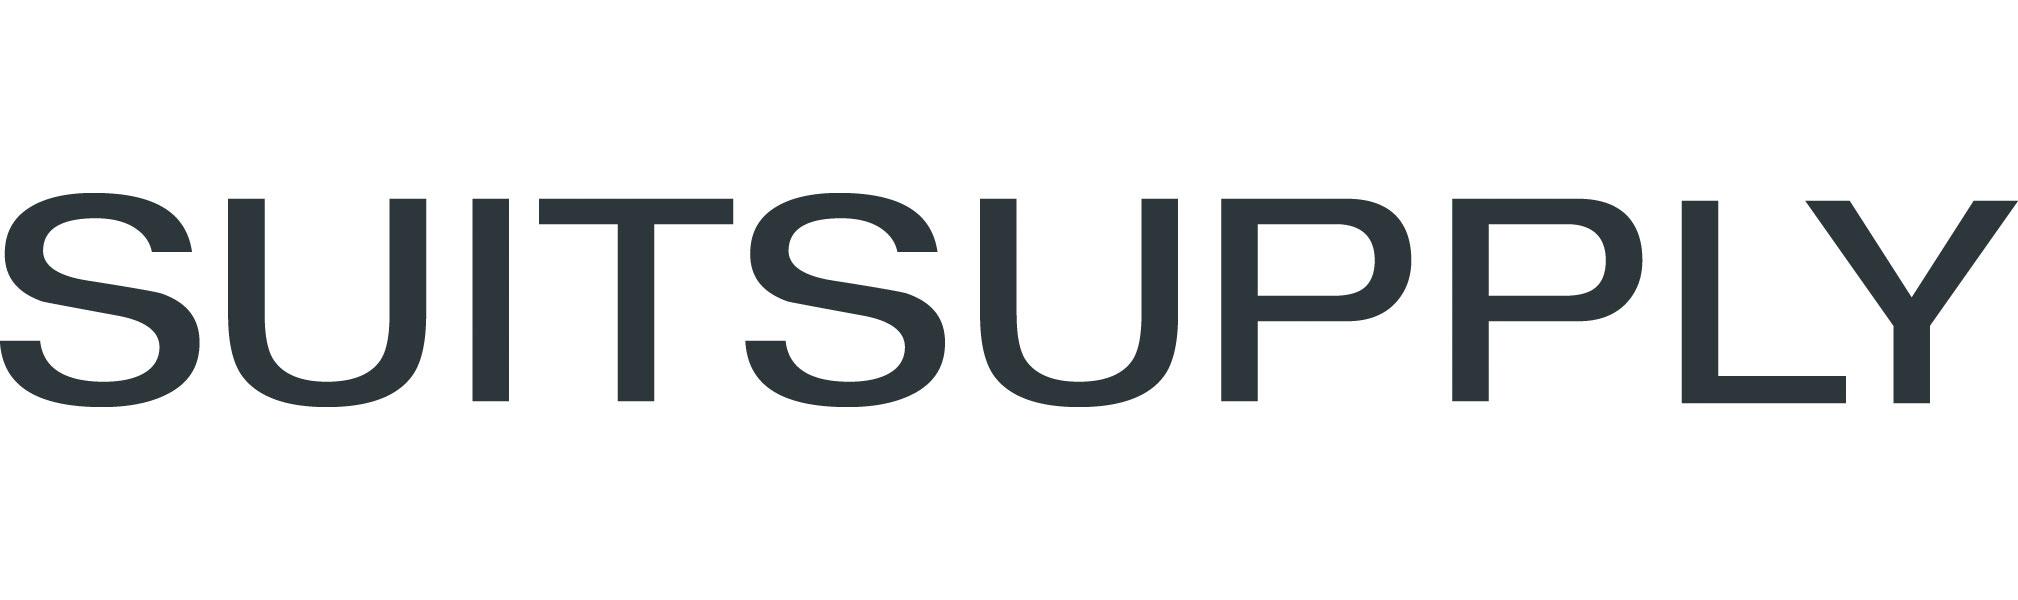 Suitsupply logo